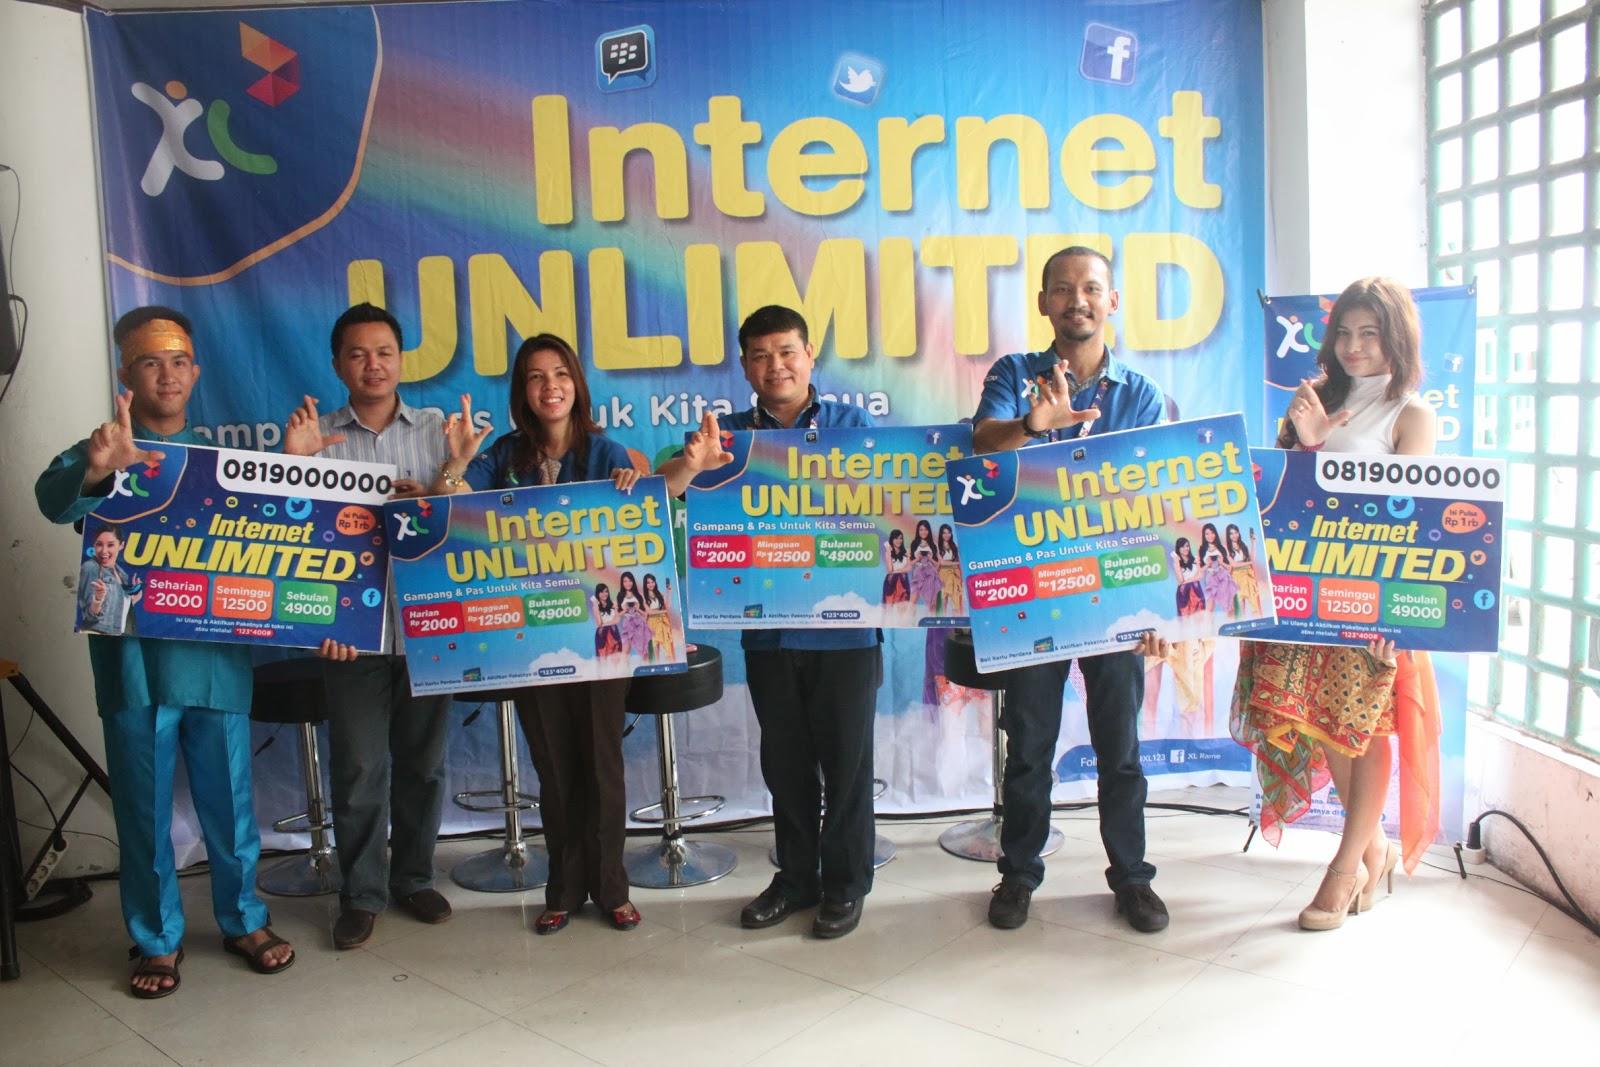 XL Hadirkan Internet Unlimited